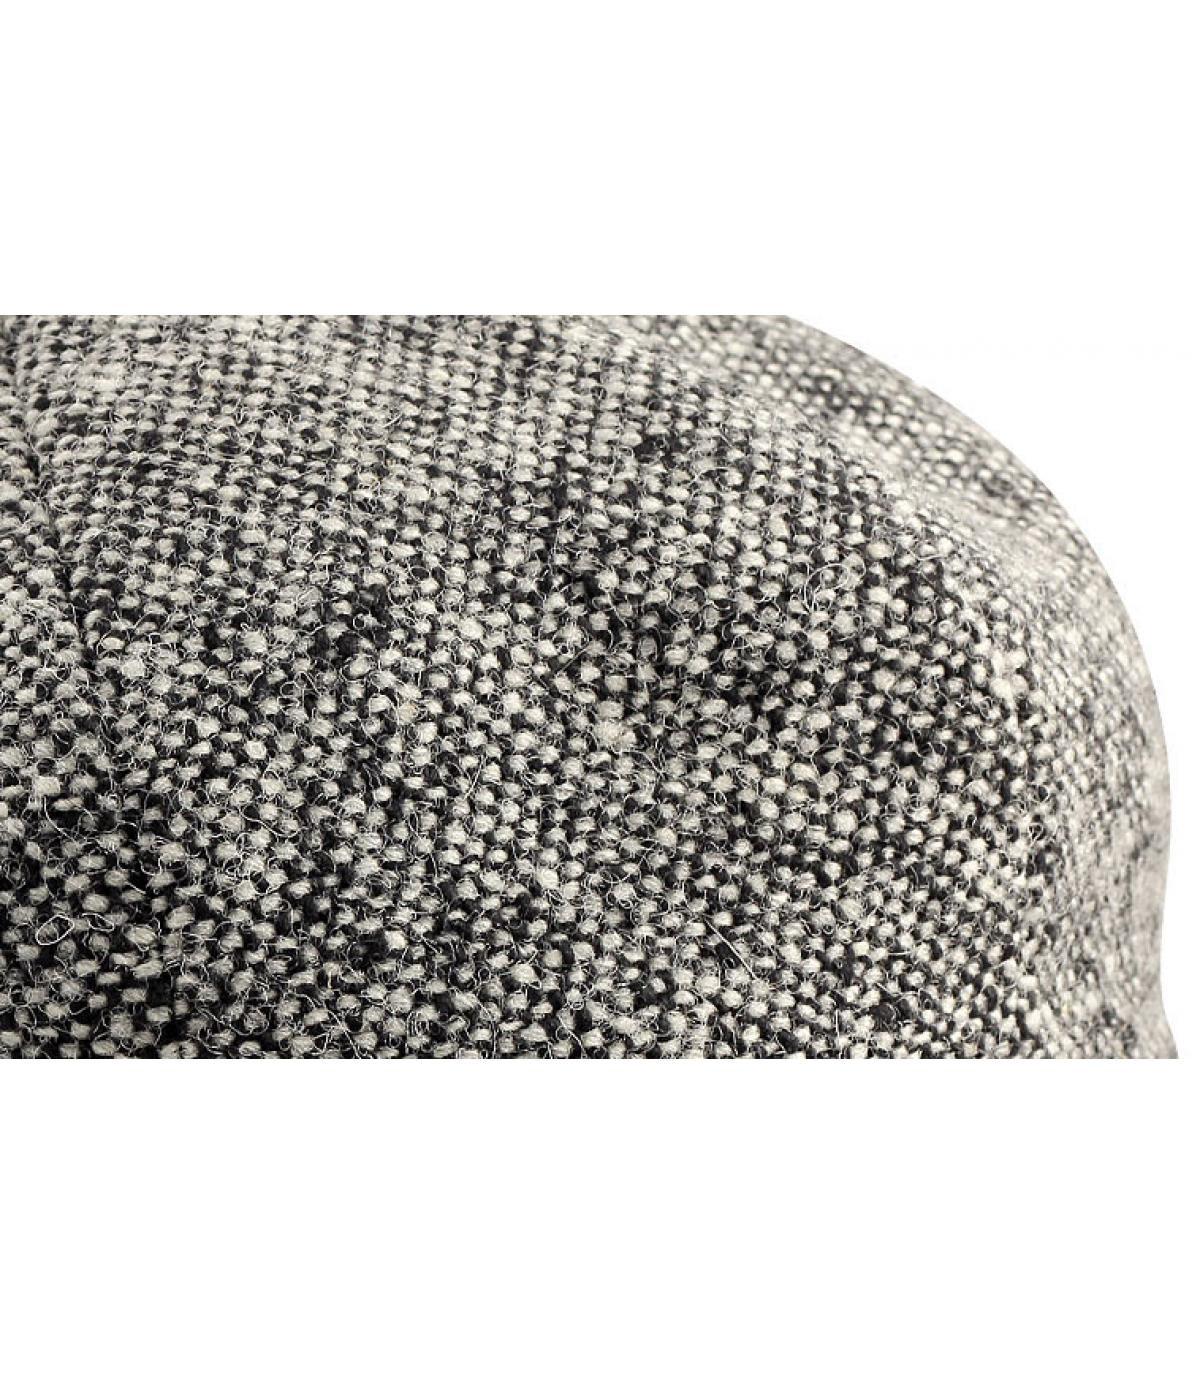 Detalles Hatteras Donegal gris imagen 2